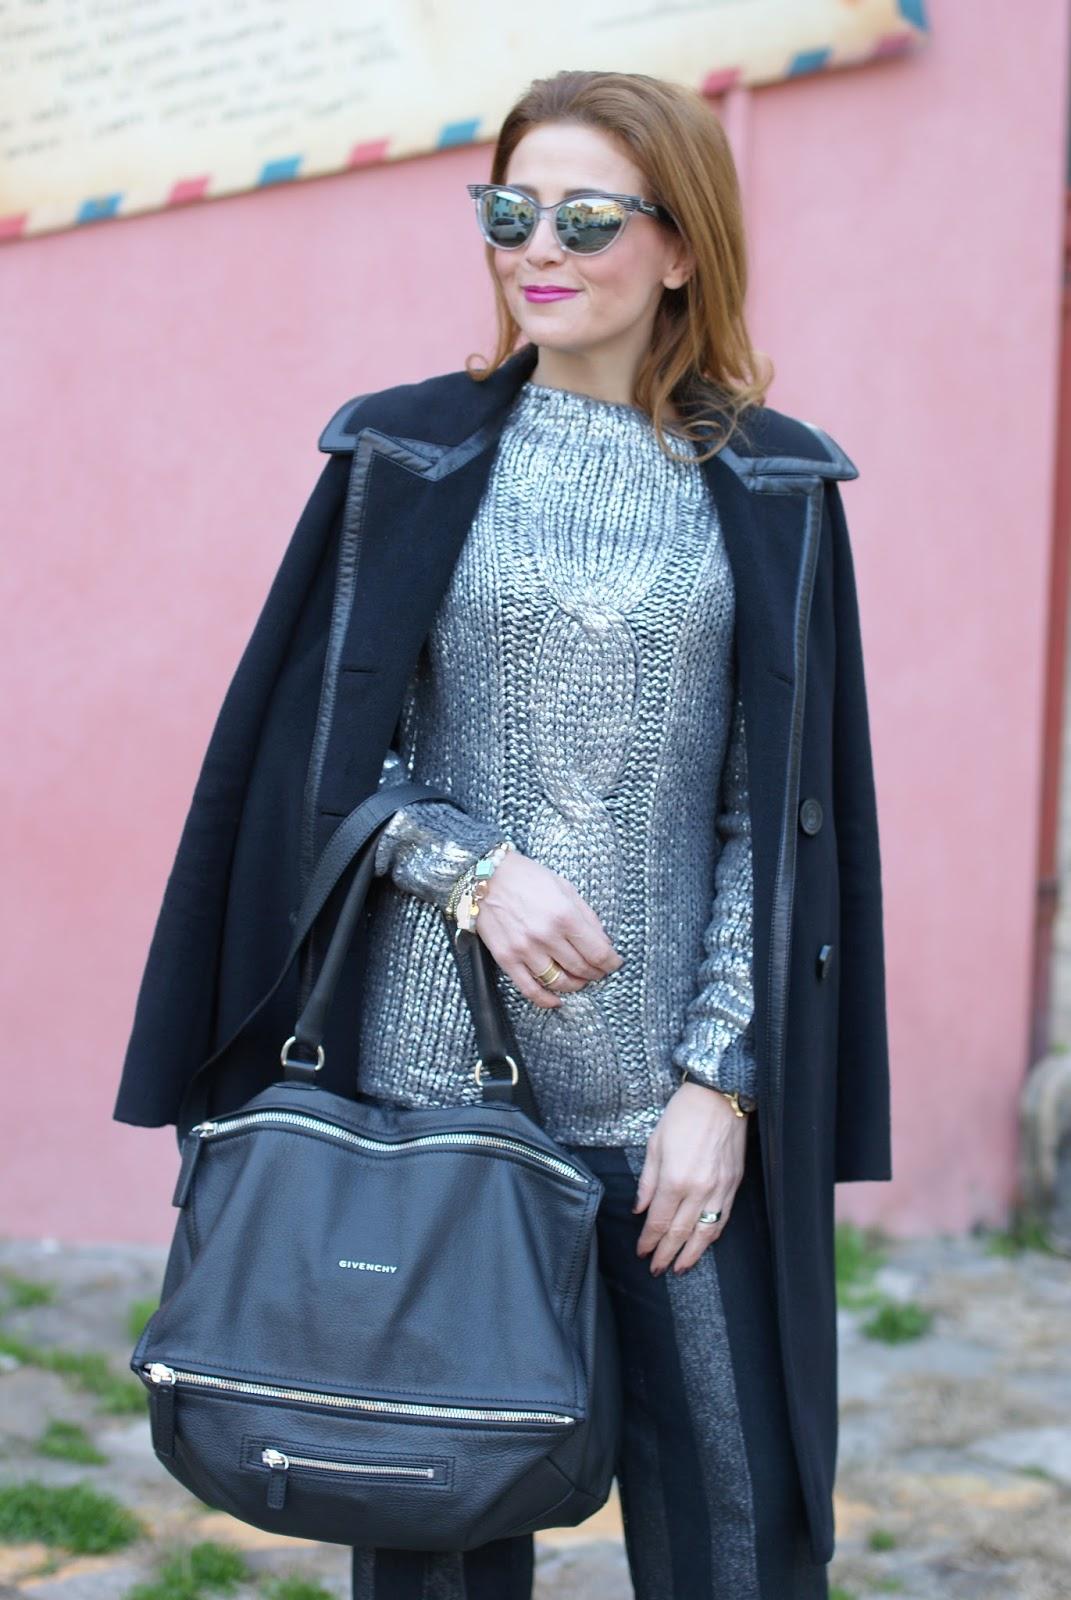 Balenciaga black coat with leather trim and Givenchy Pandora bag on Fashion and Cookies fashion blog, fashion blogger style